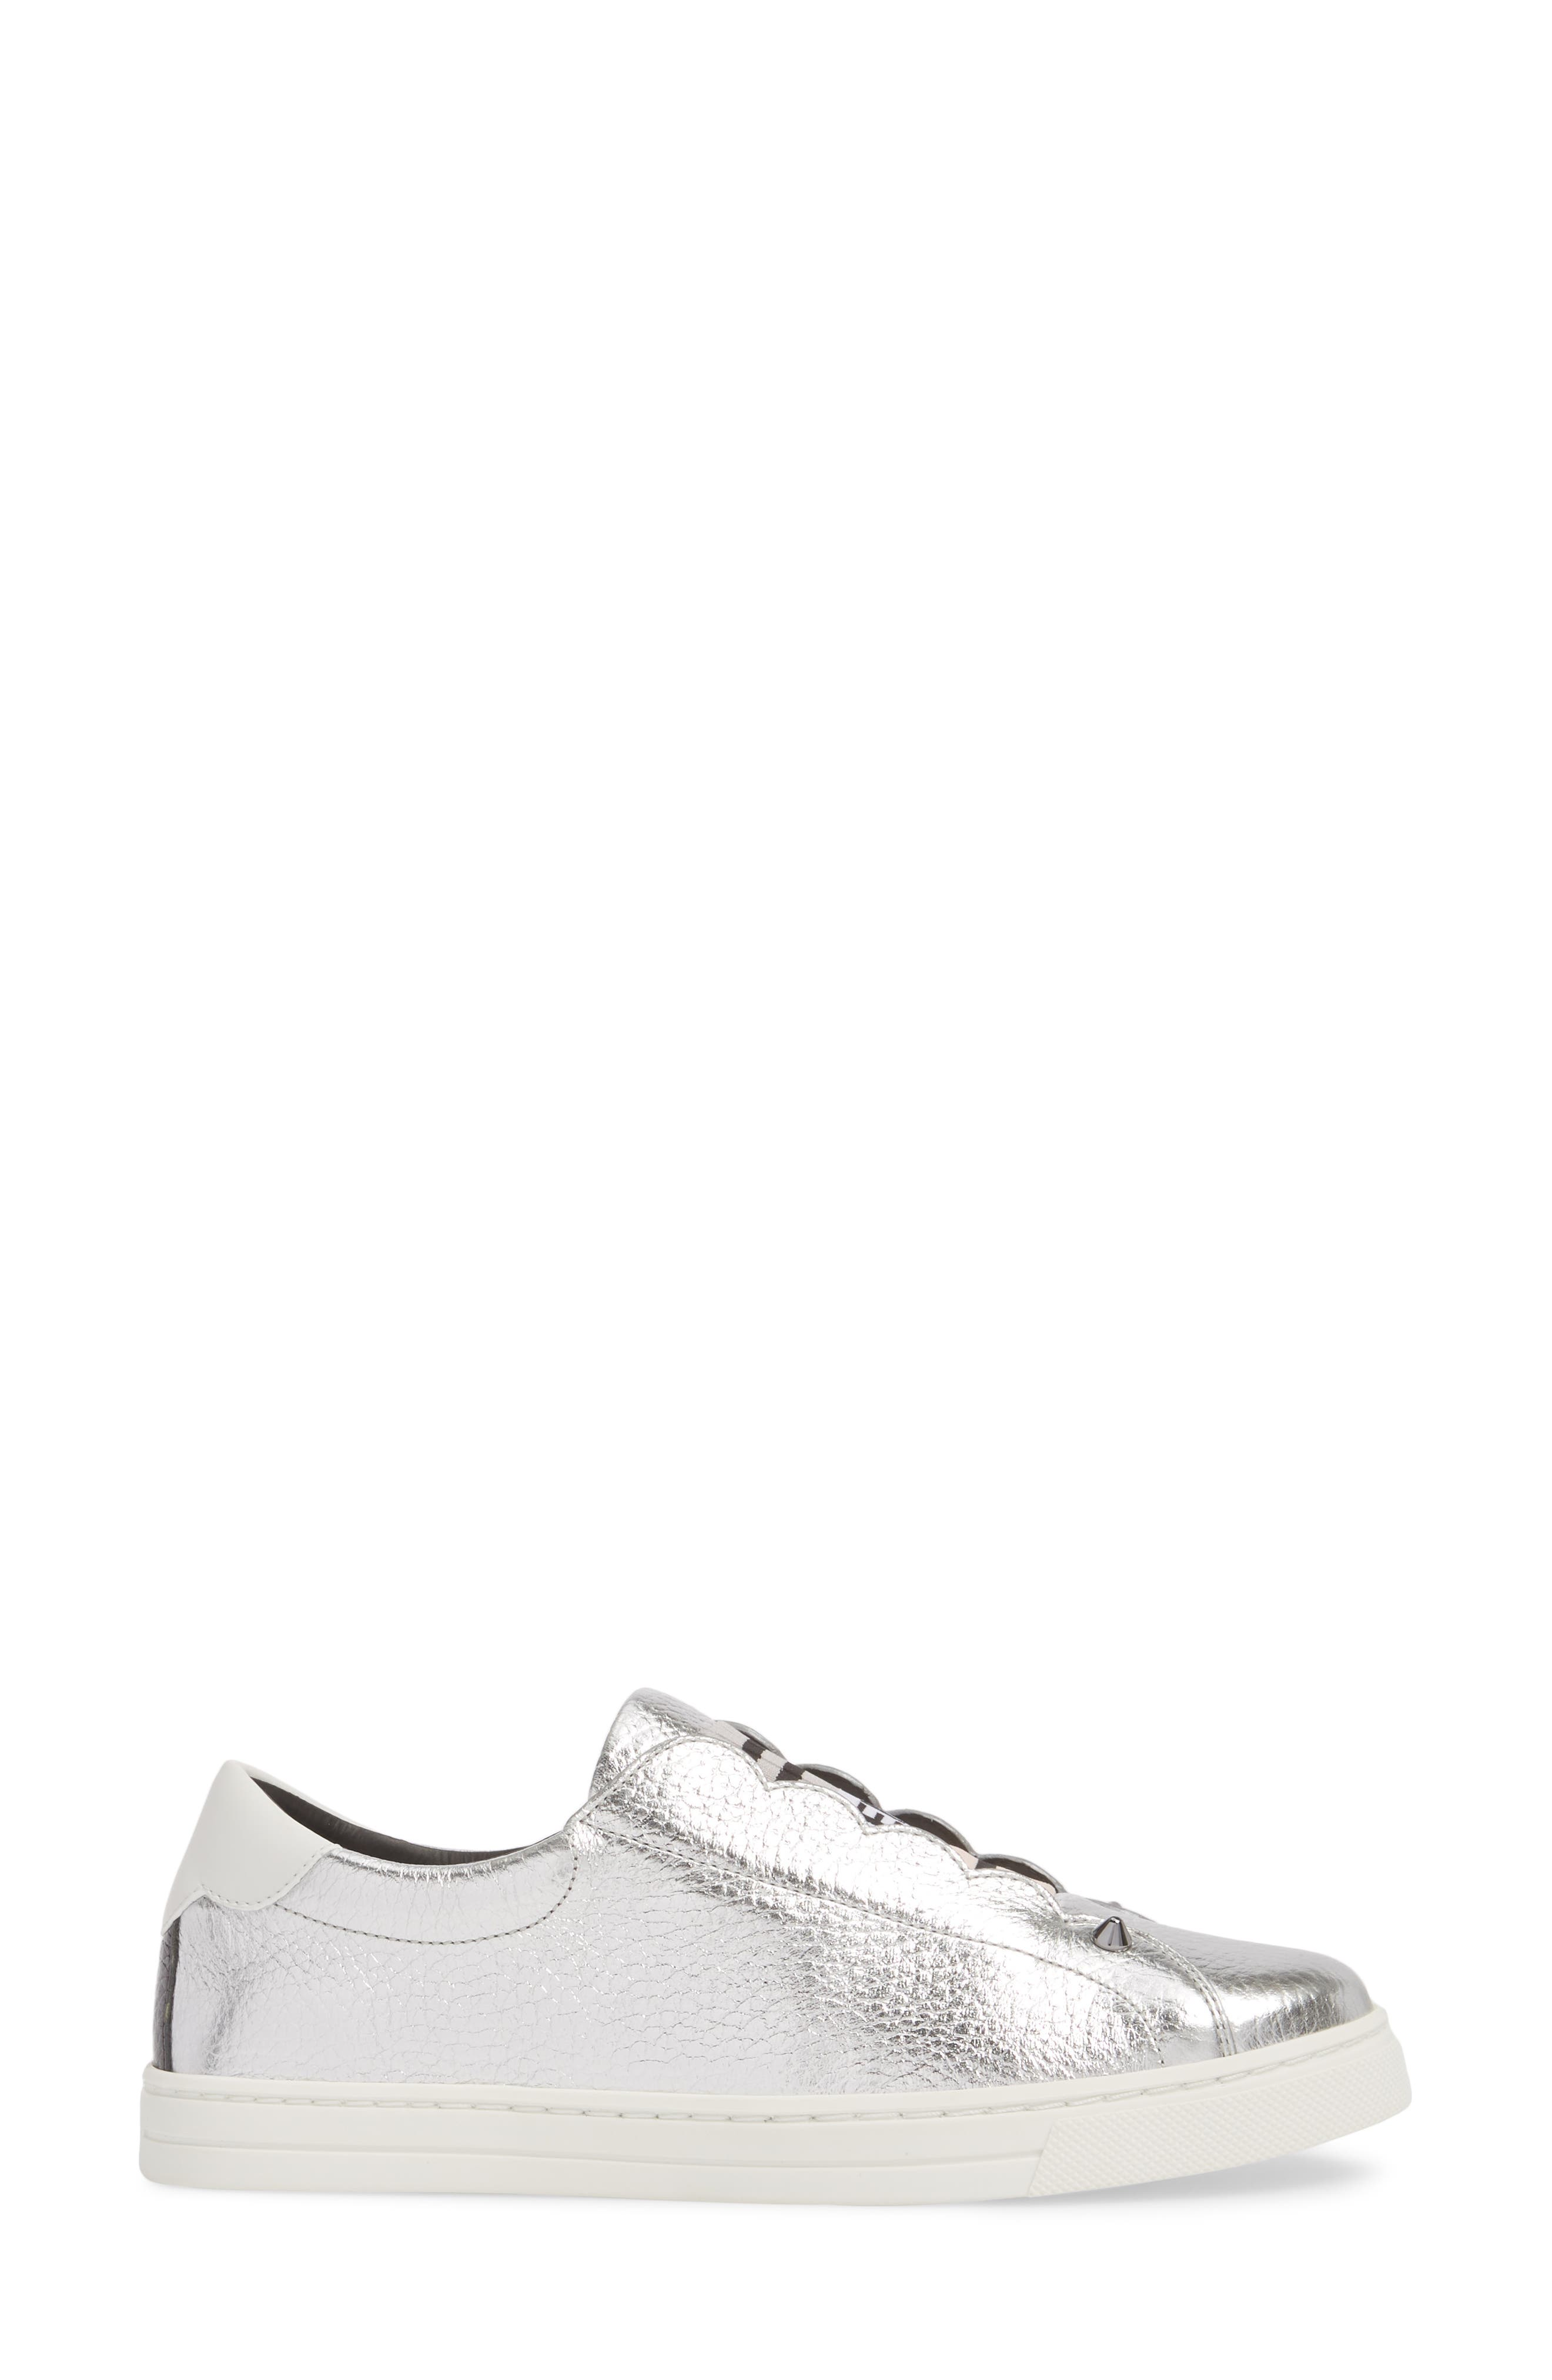 Rockono Slip-On Sneaker,                             Alternate thumbnail 3, color,                             SILVER